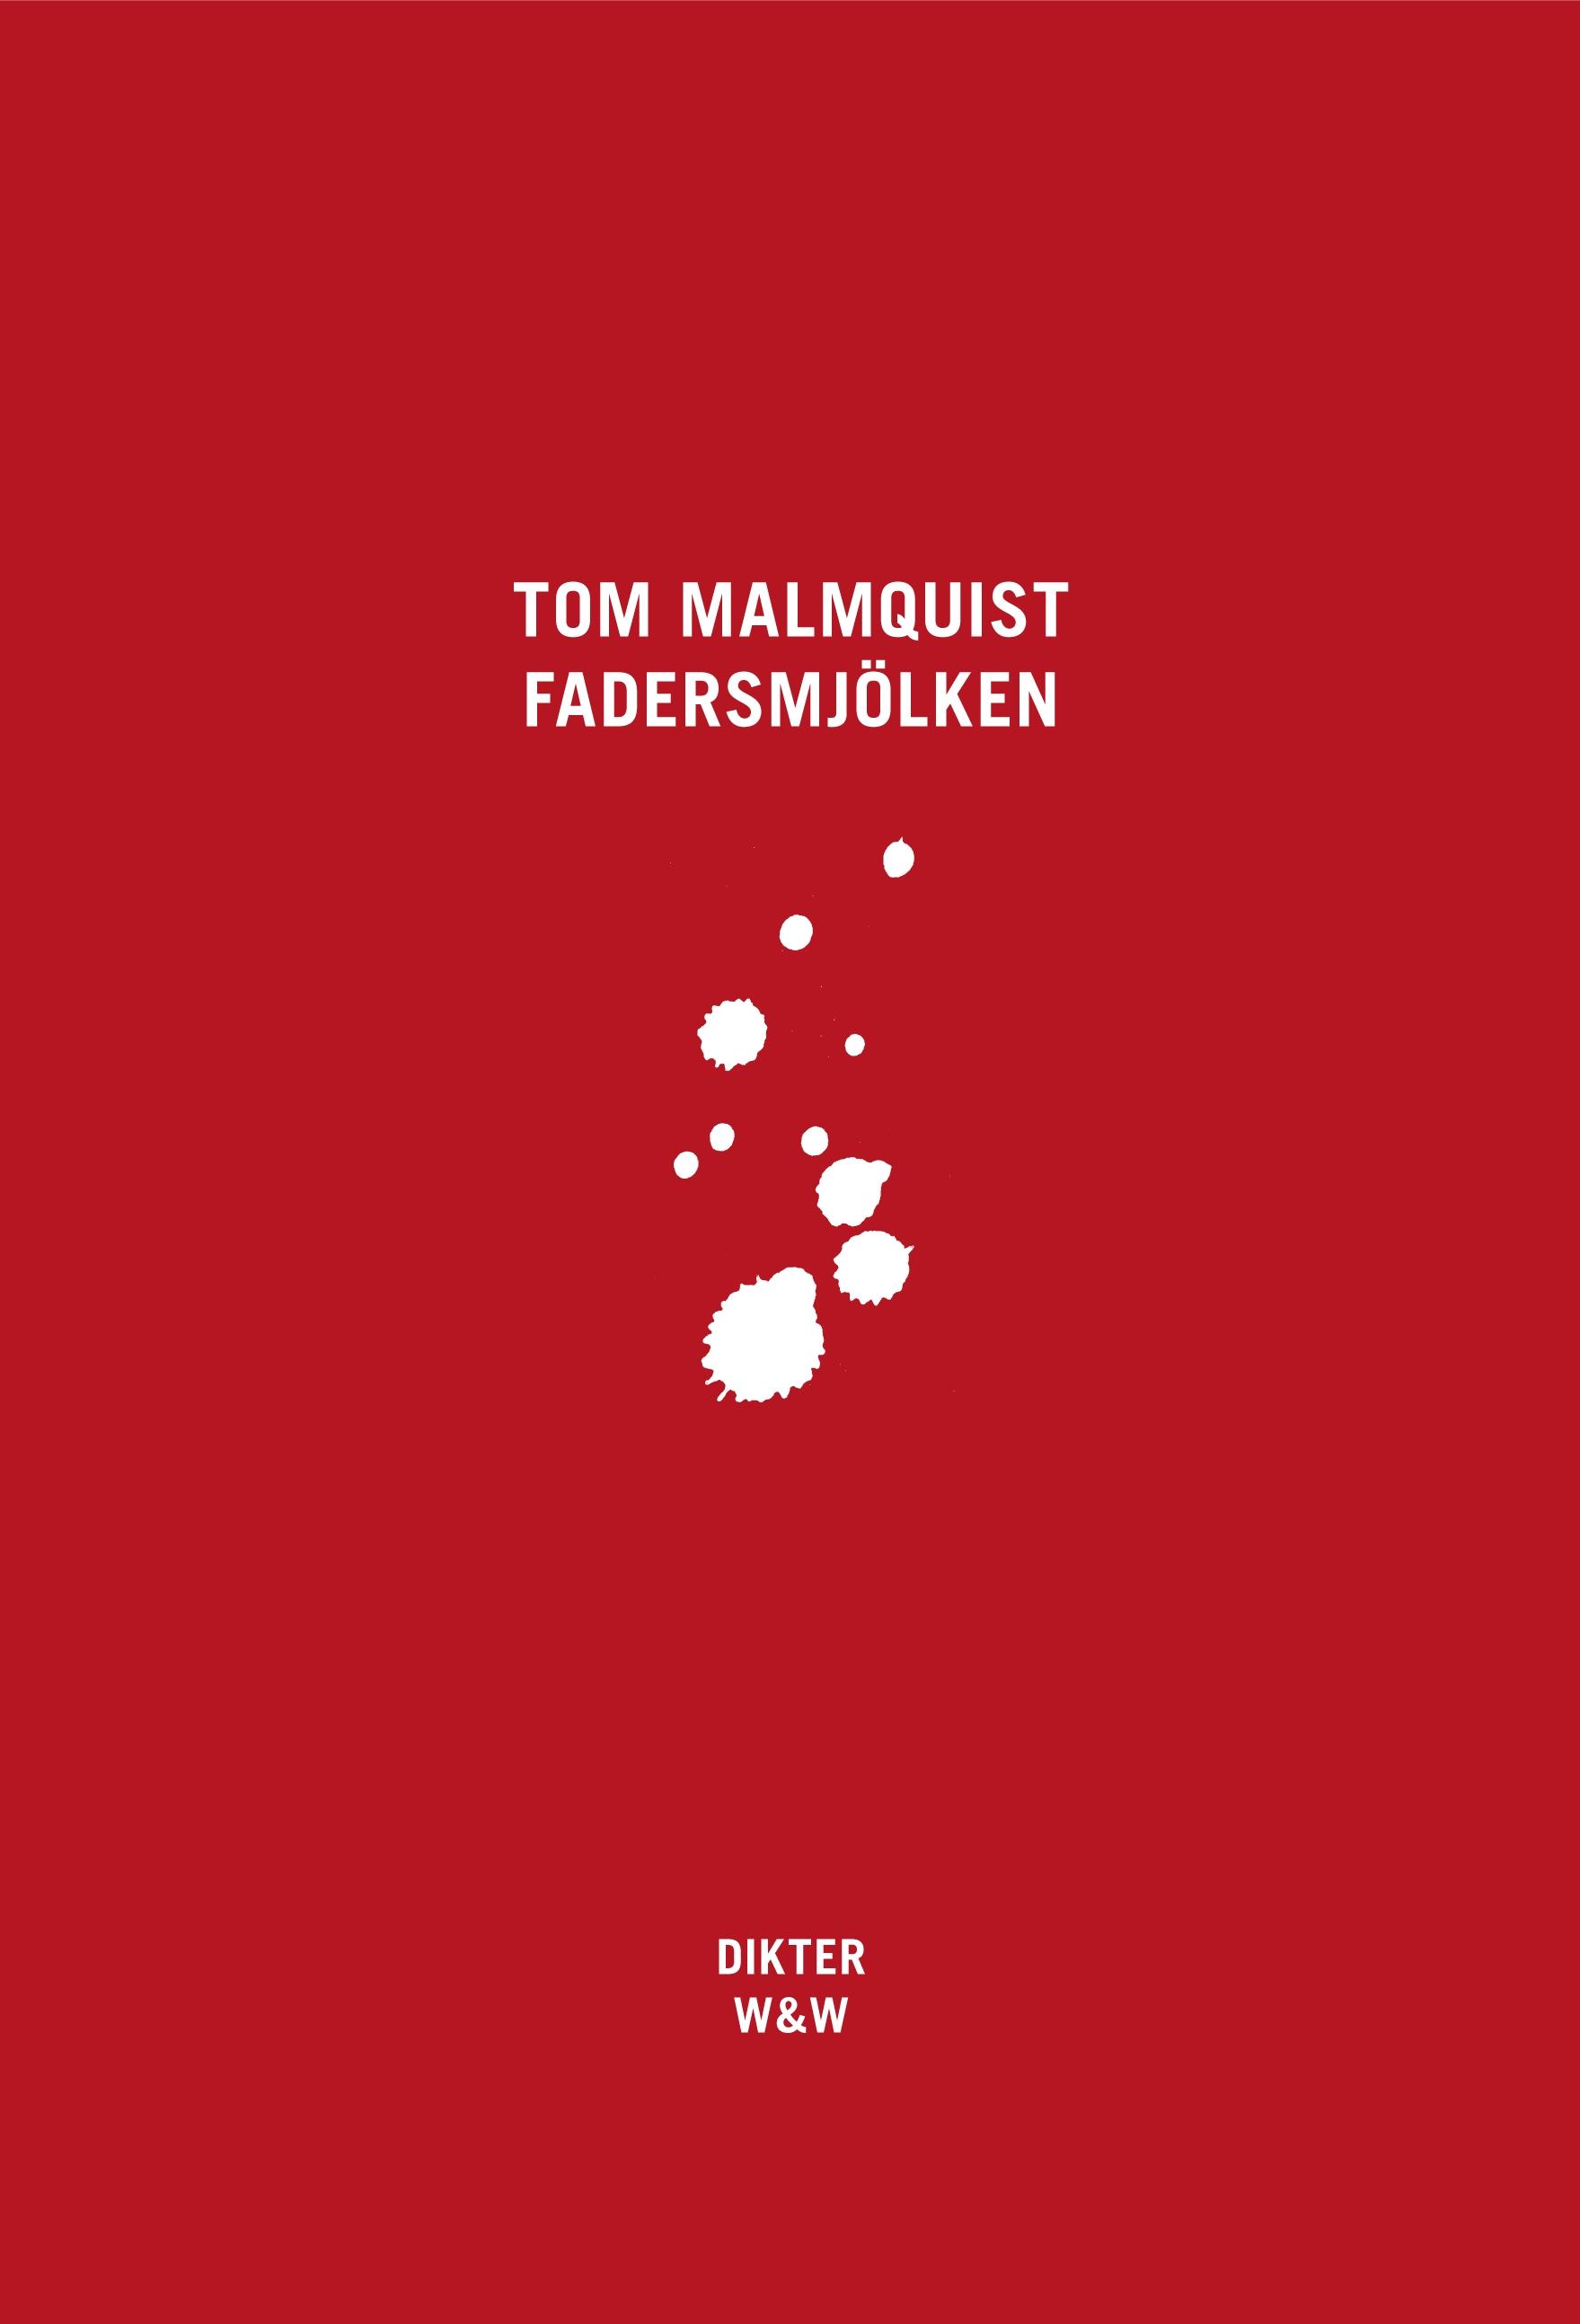 Malmquist, Fadersmjölken, W&W, 2009